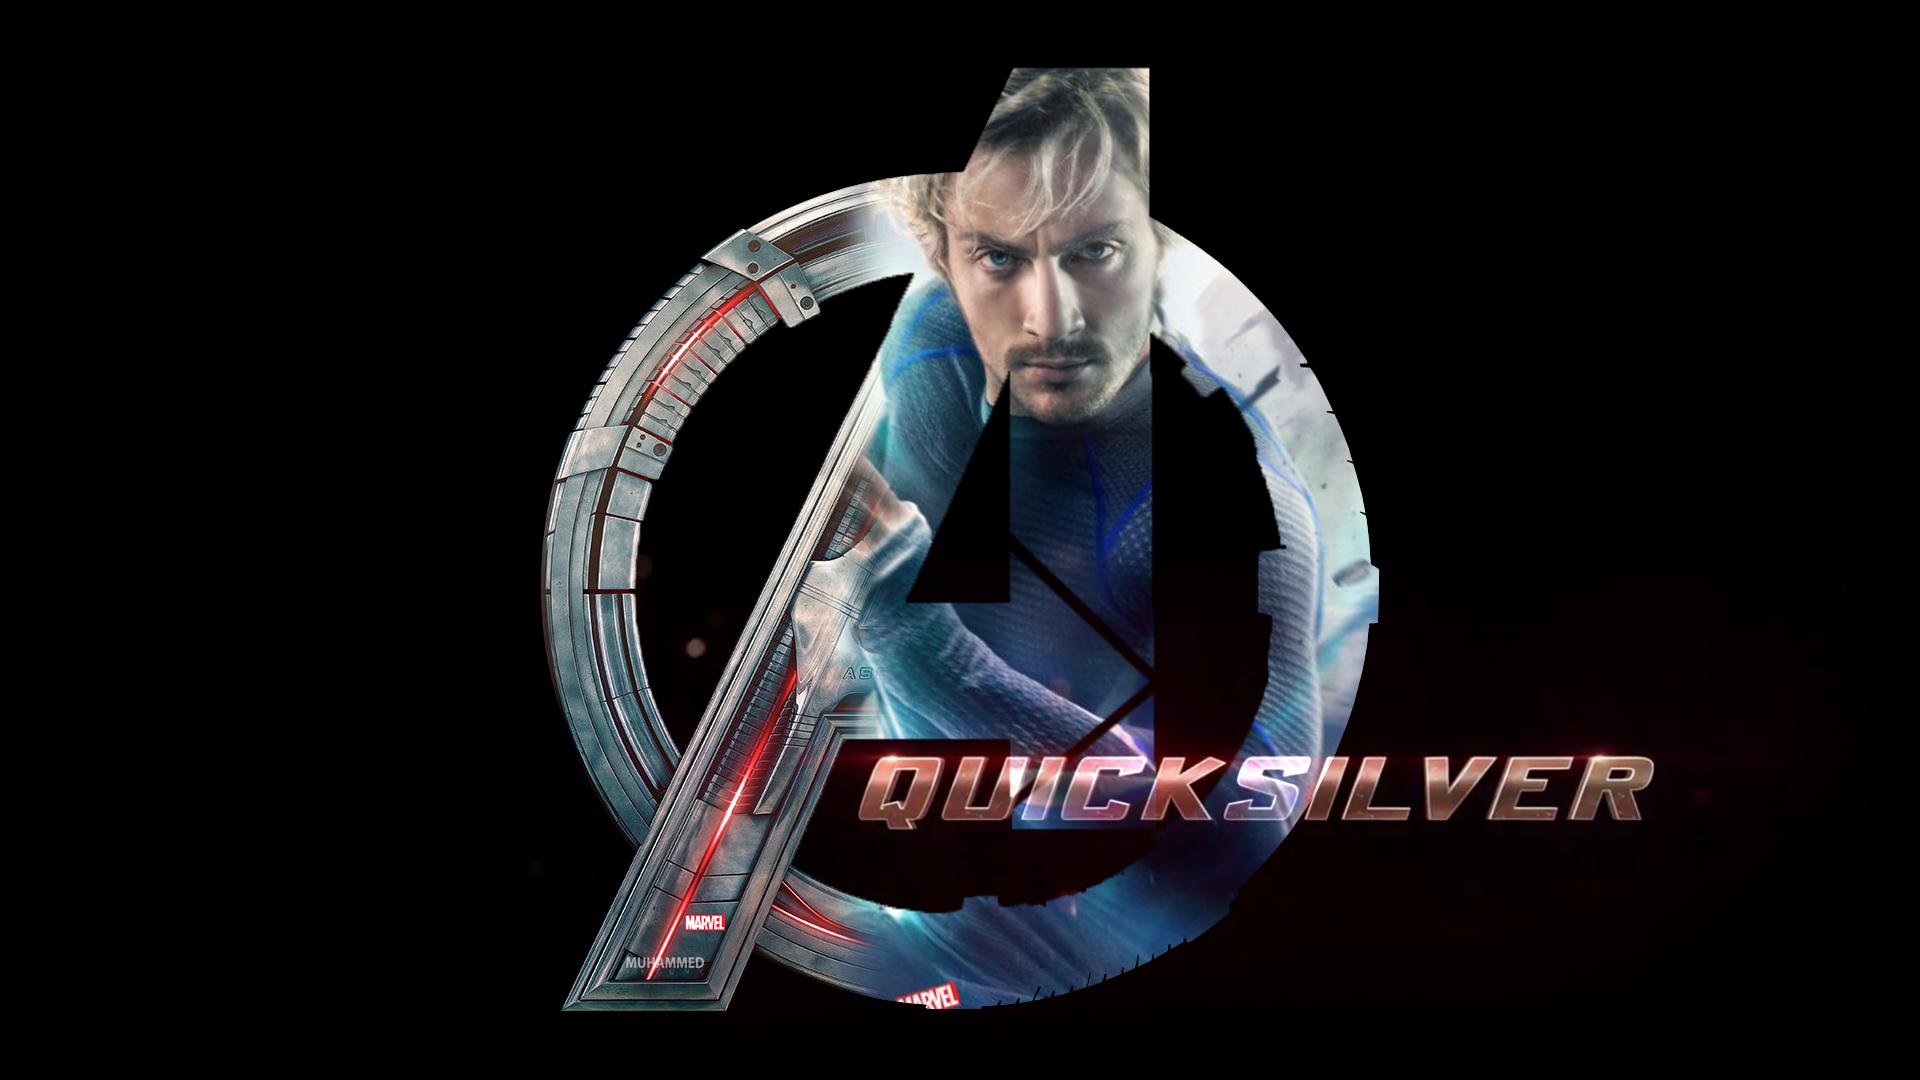 Quicksilver marvel movie